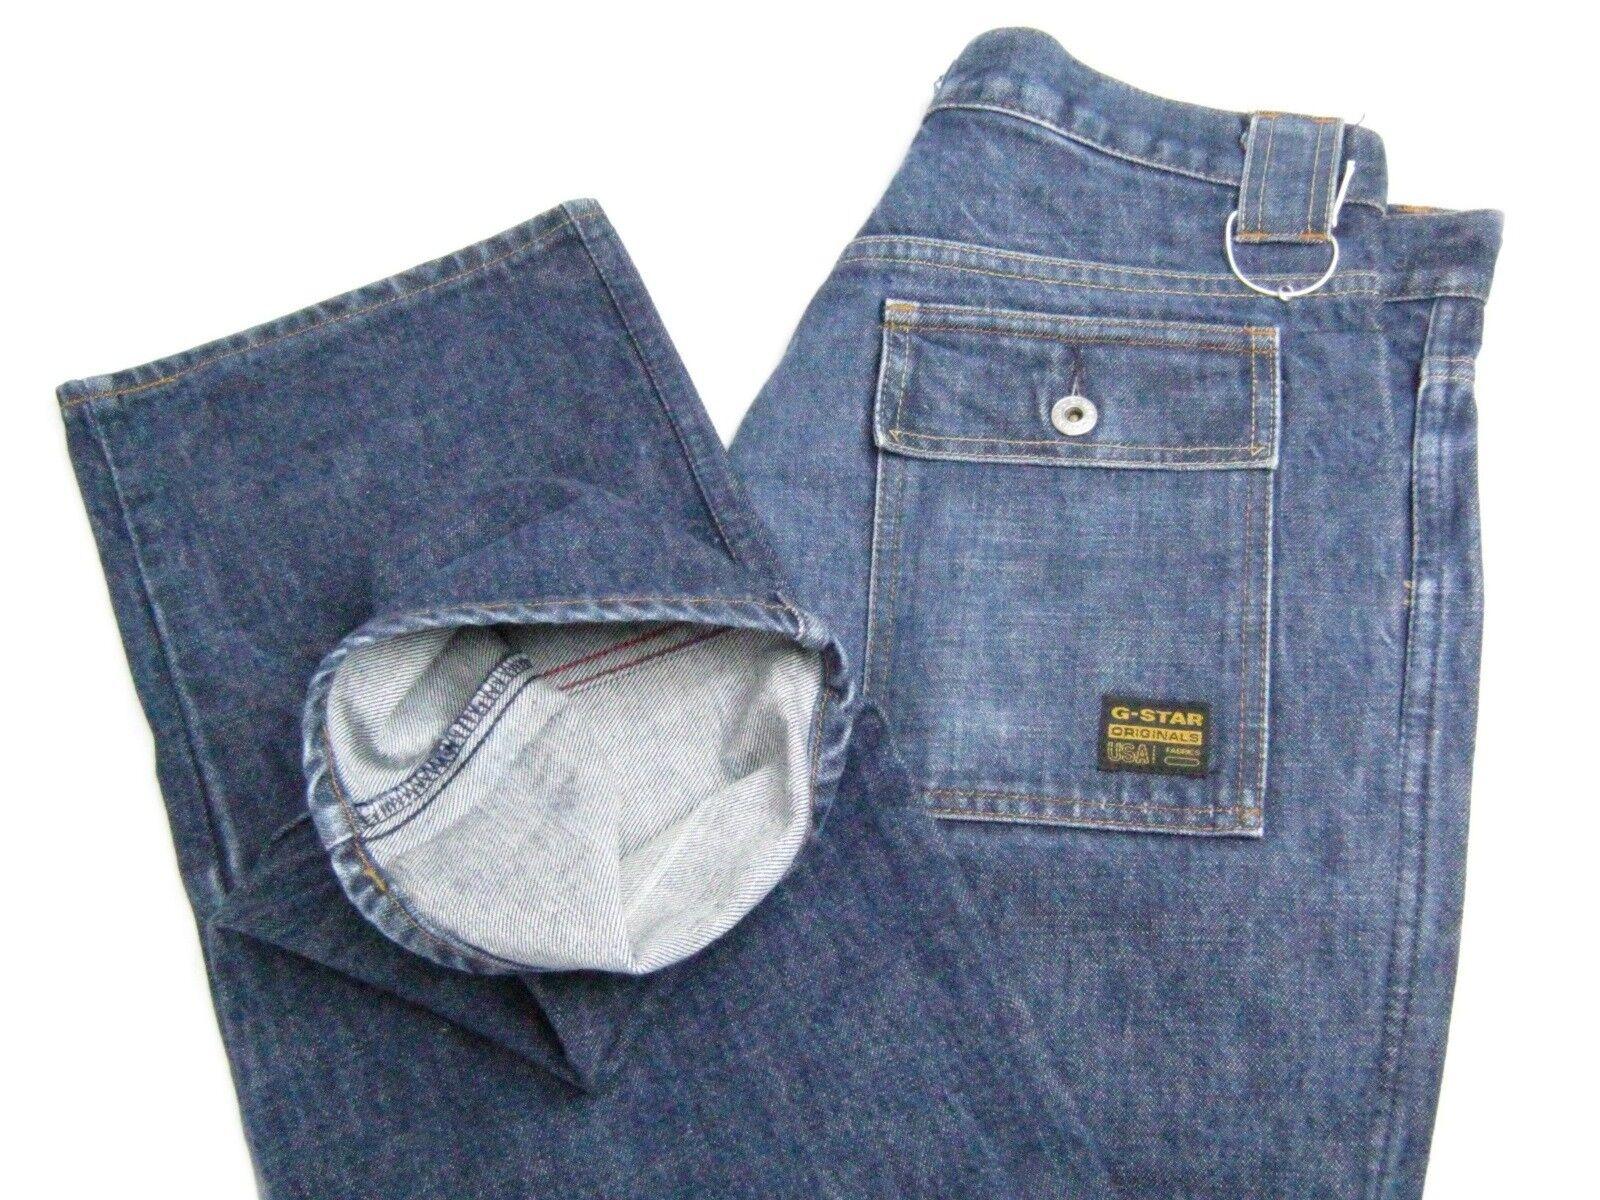 G STAR RAW EXPLORER Mens Cotton Cargo bluee Jeans Denim Size W36 L33 Regular Fit